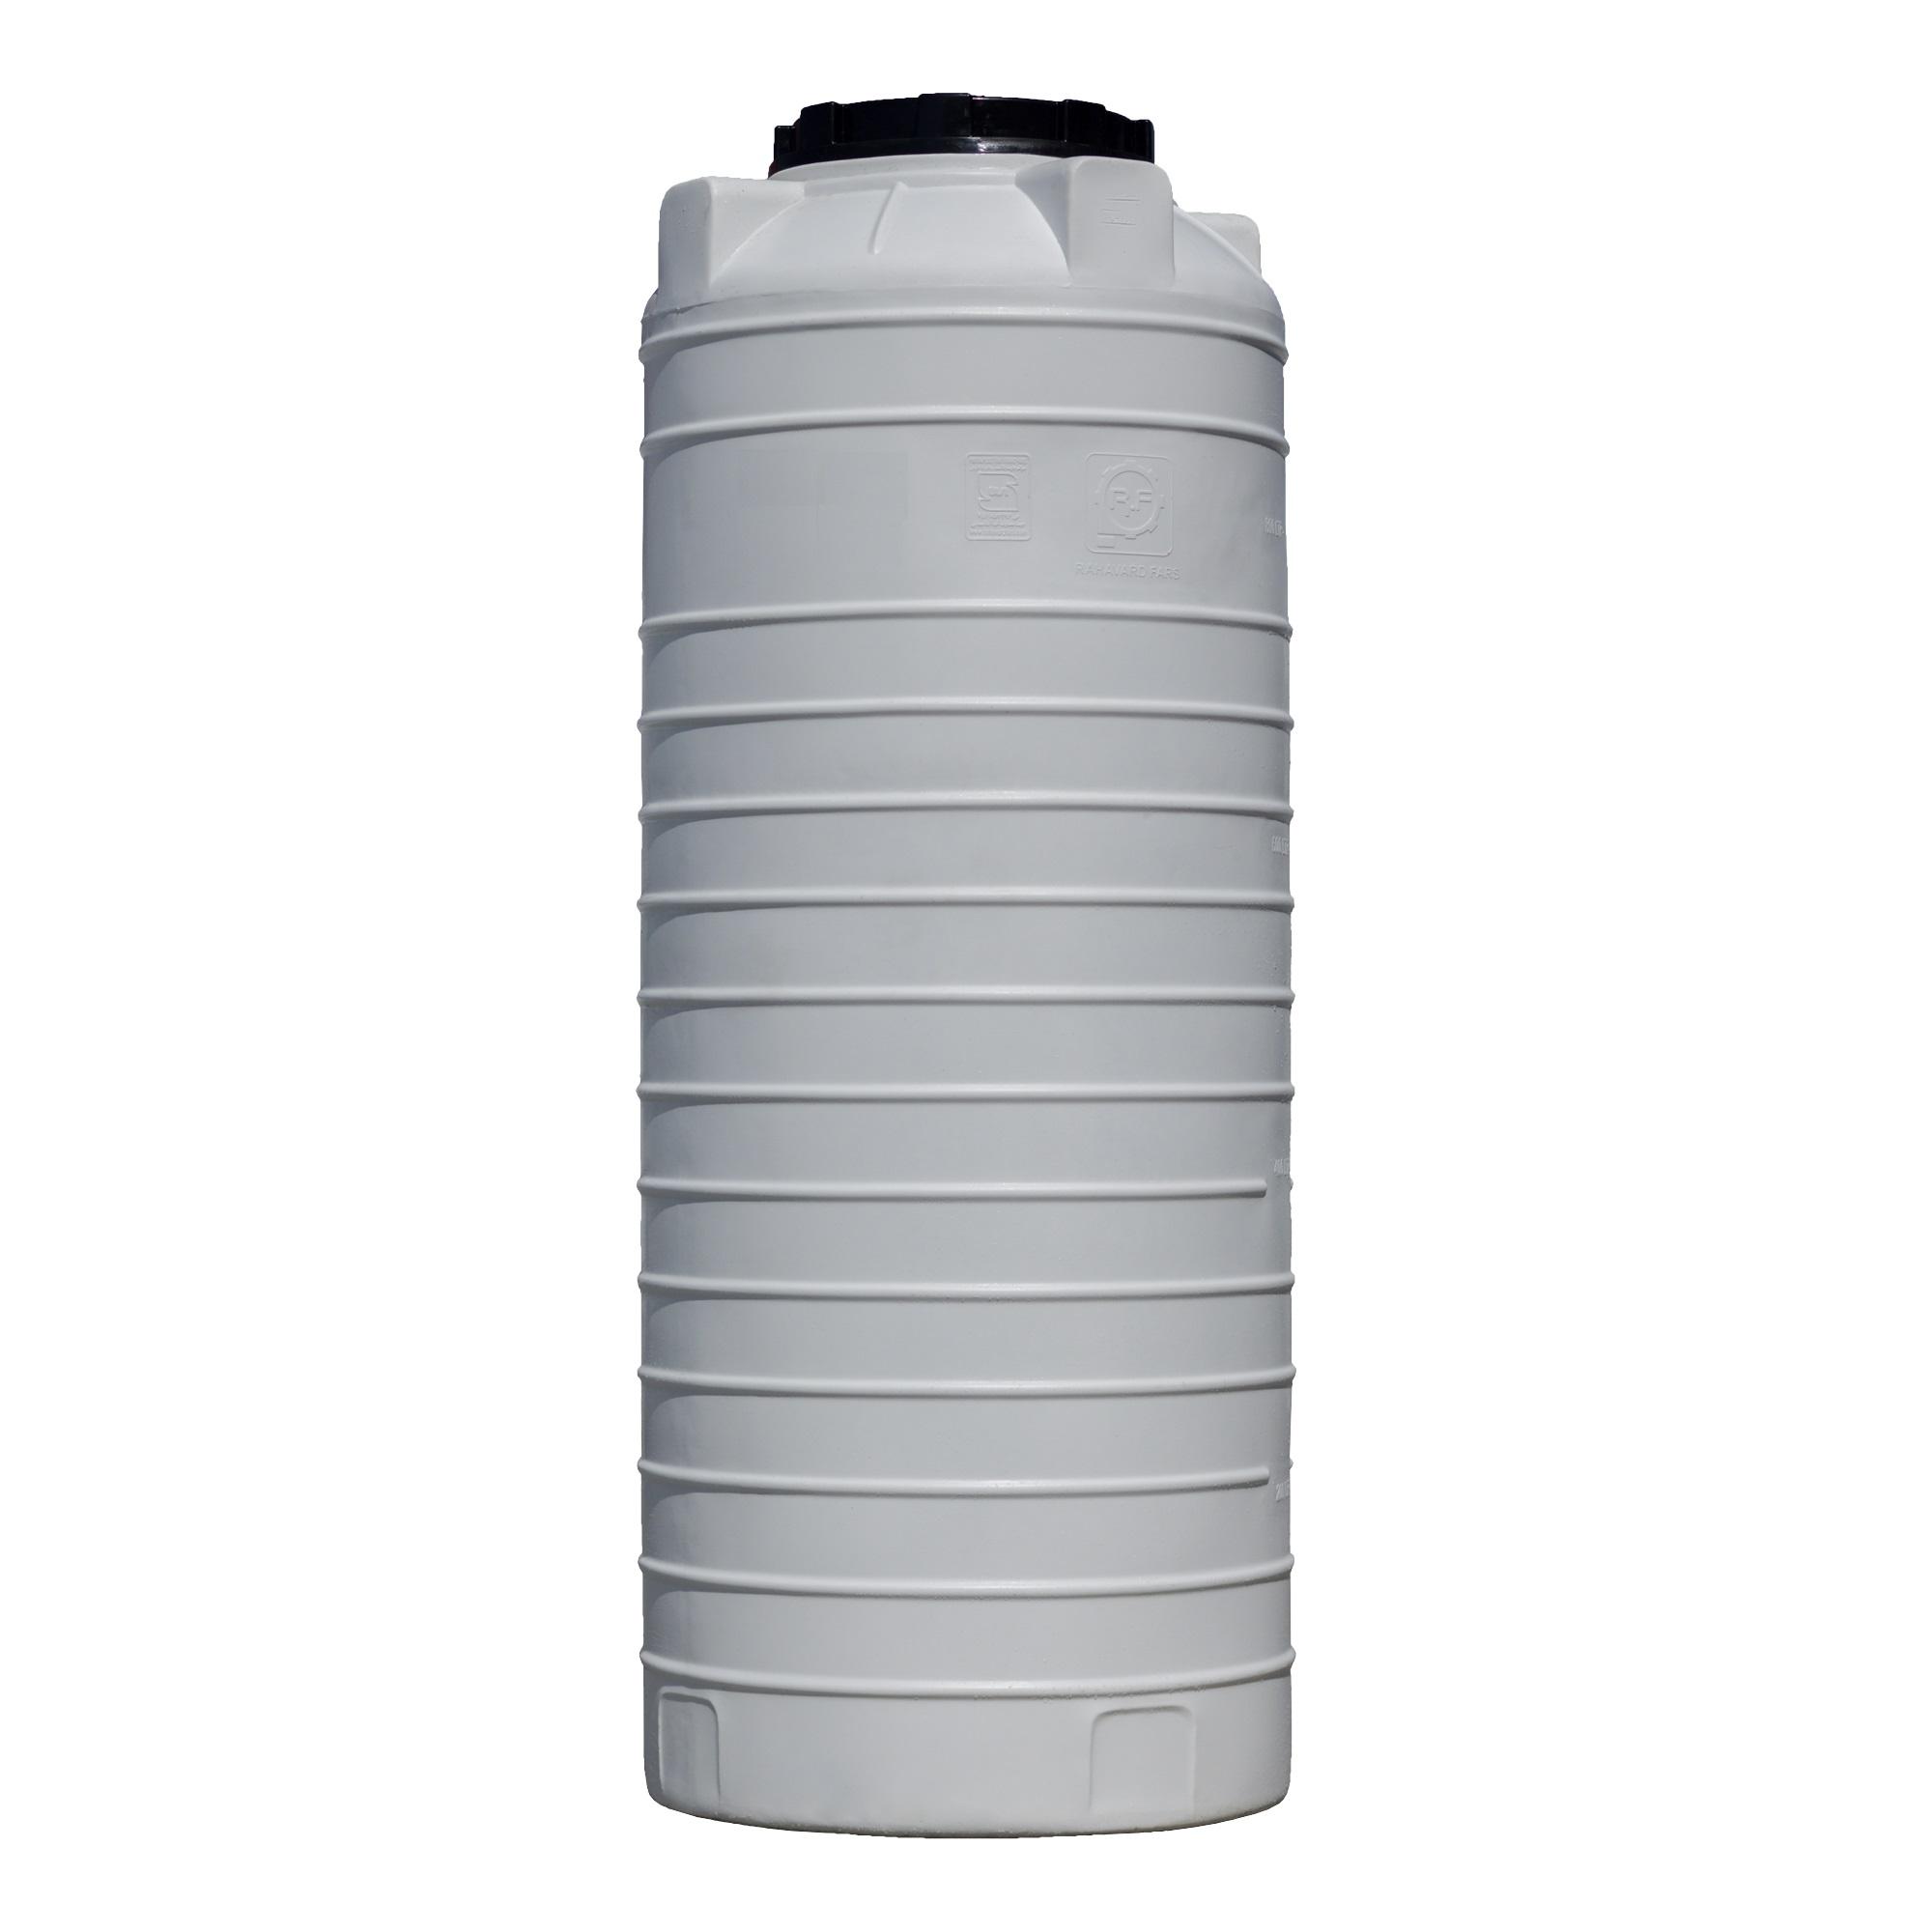 قیمت                                      مخزن آب رهاورد فارس کد 4876 حجم 1000 لیتر